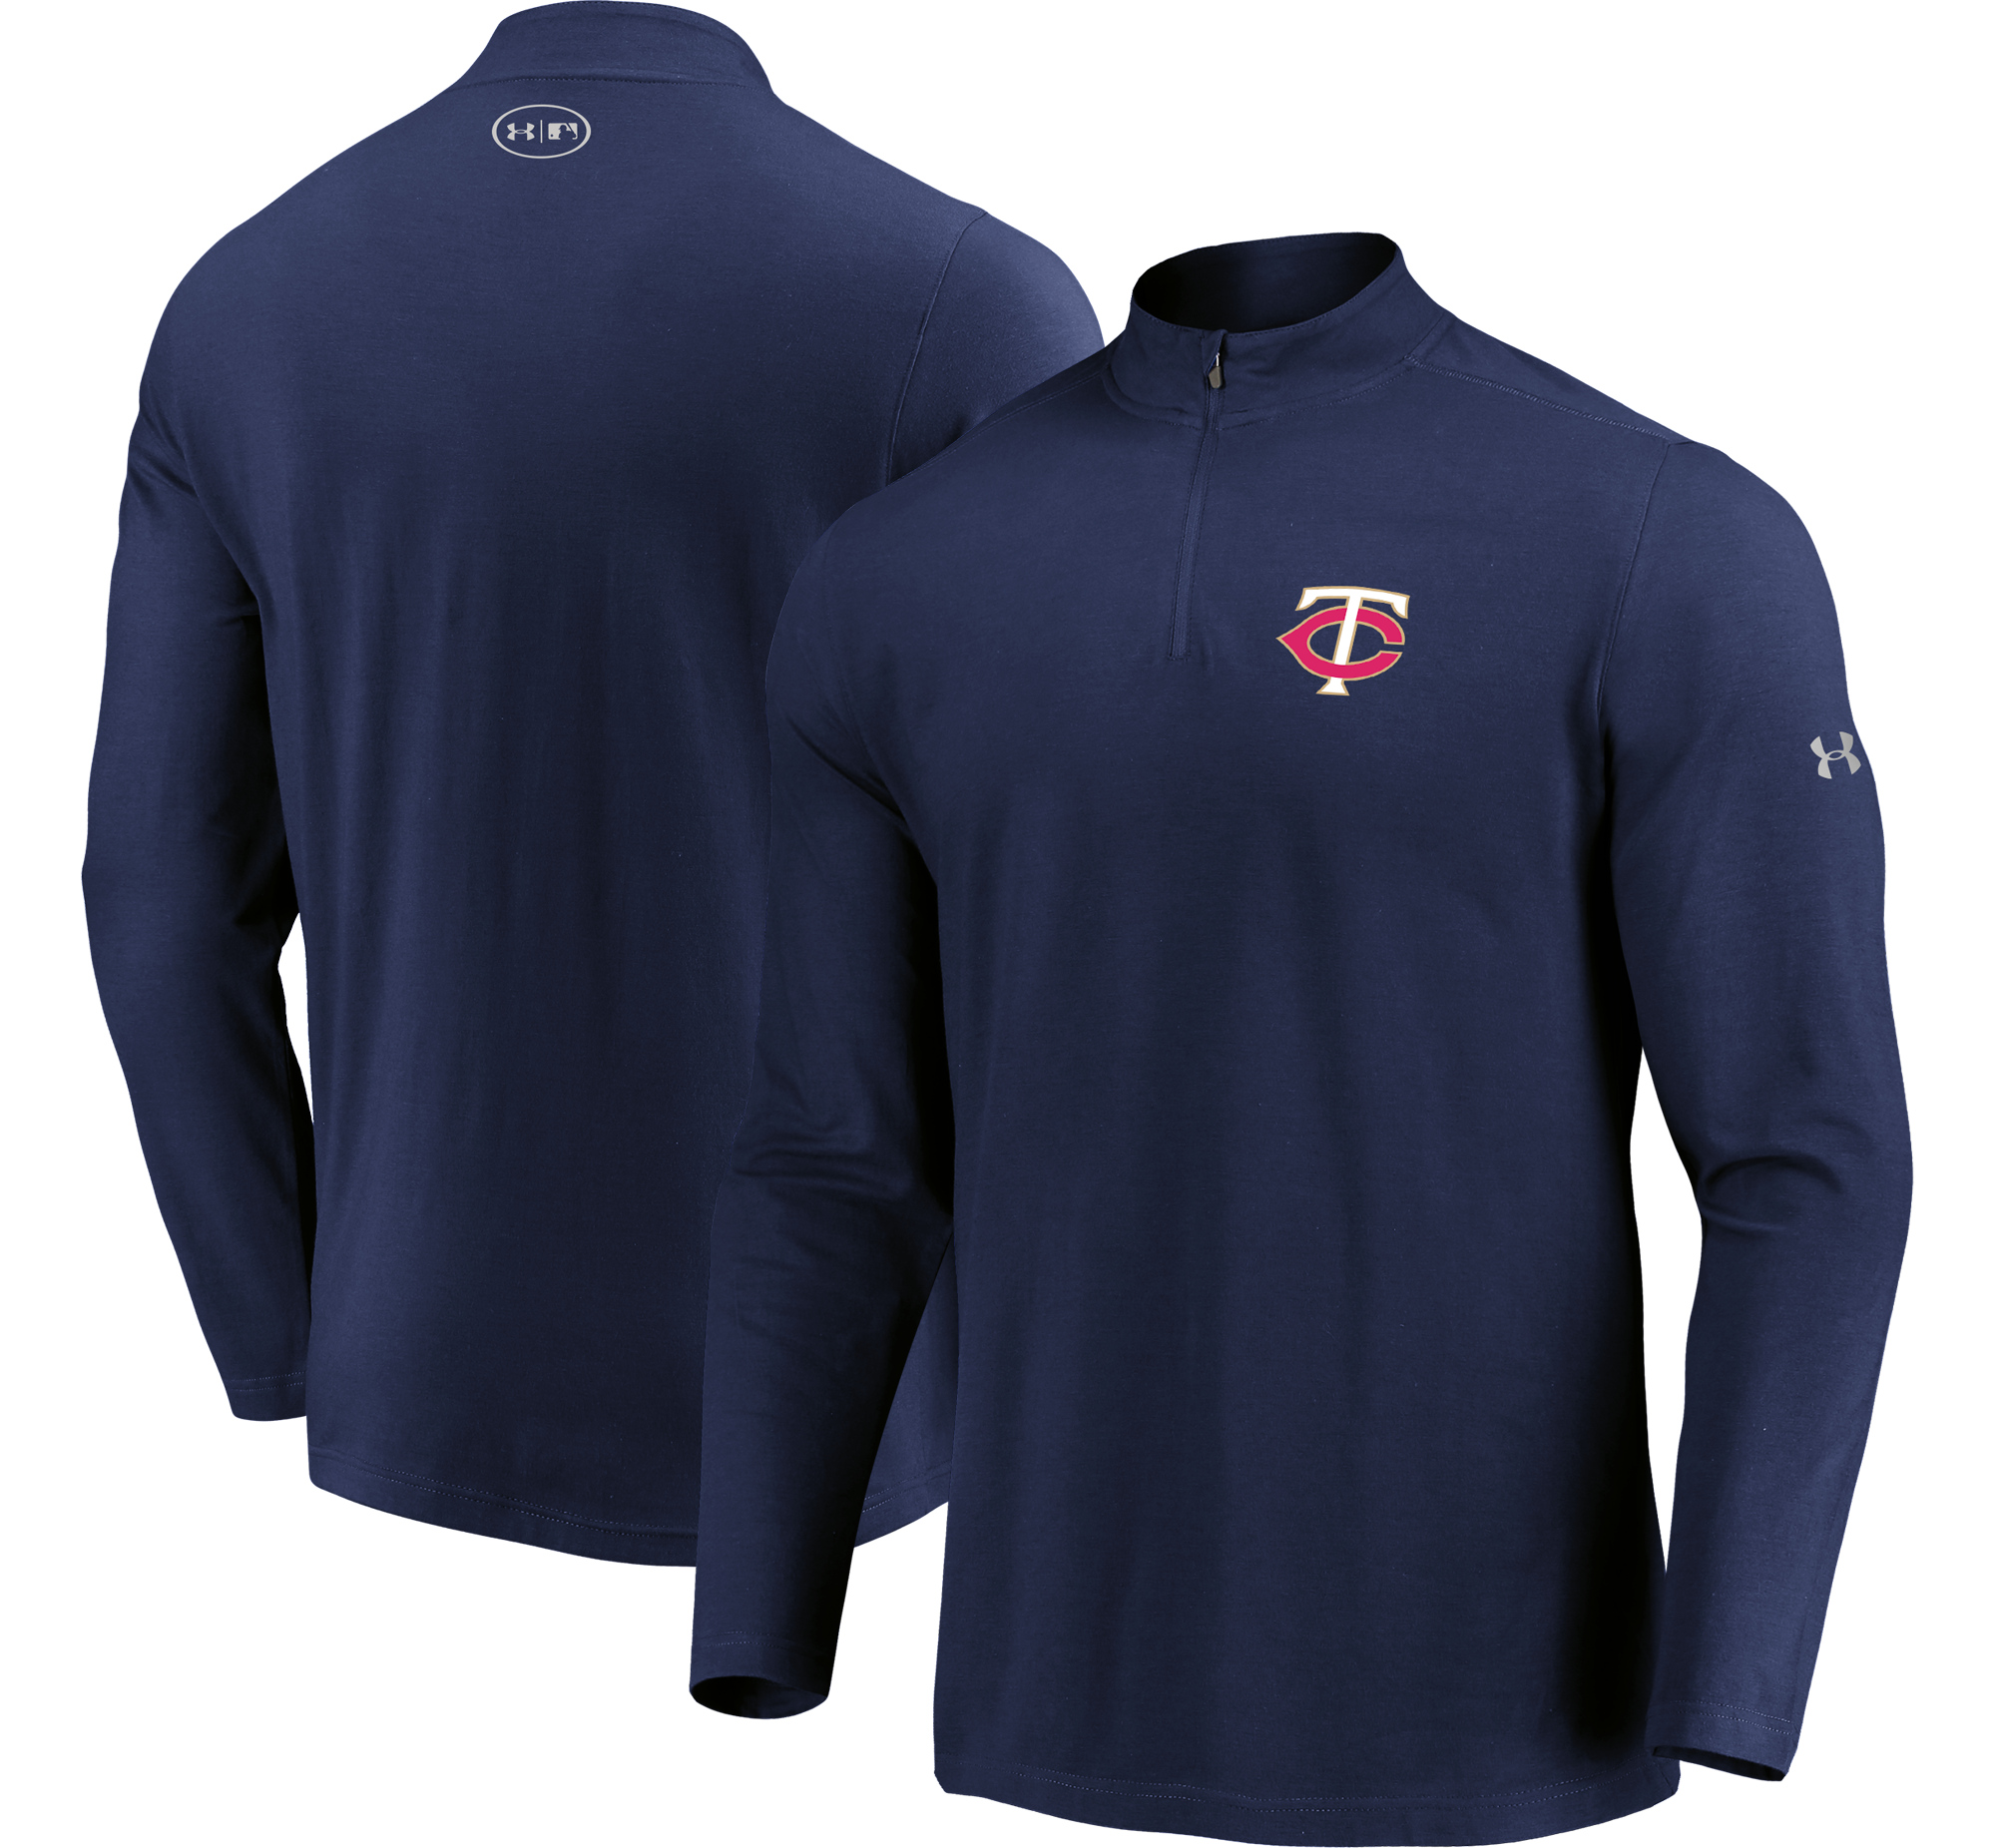 Minnesota Twins Under Armour Passion Performance Tri-Blend Quarter-Zip Pullover Jacket - Navy